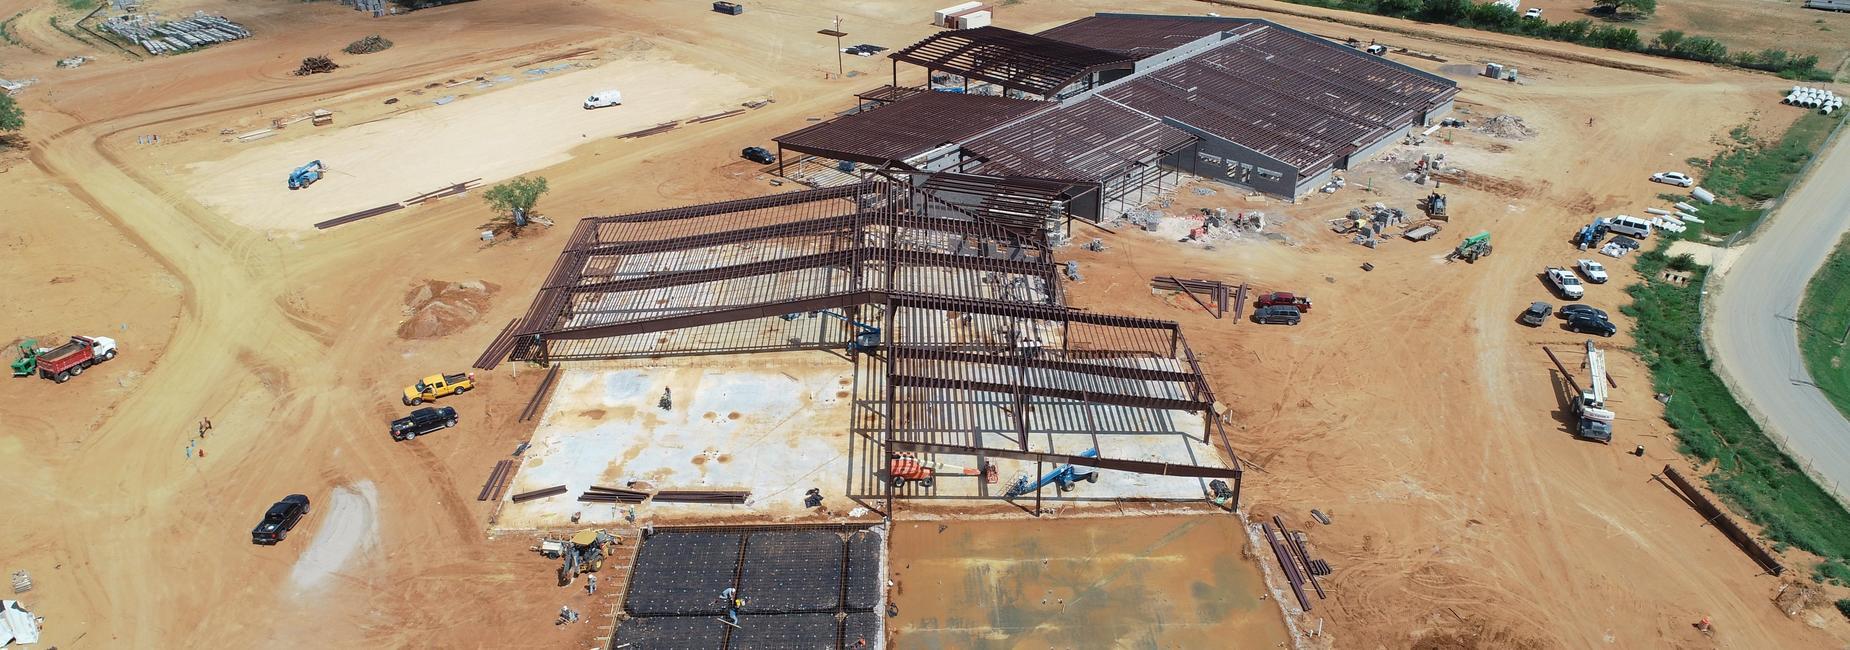 New Burks Construction Site